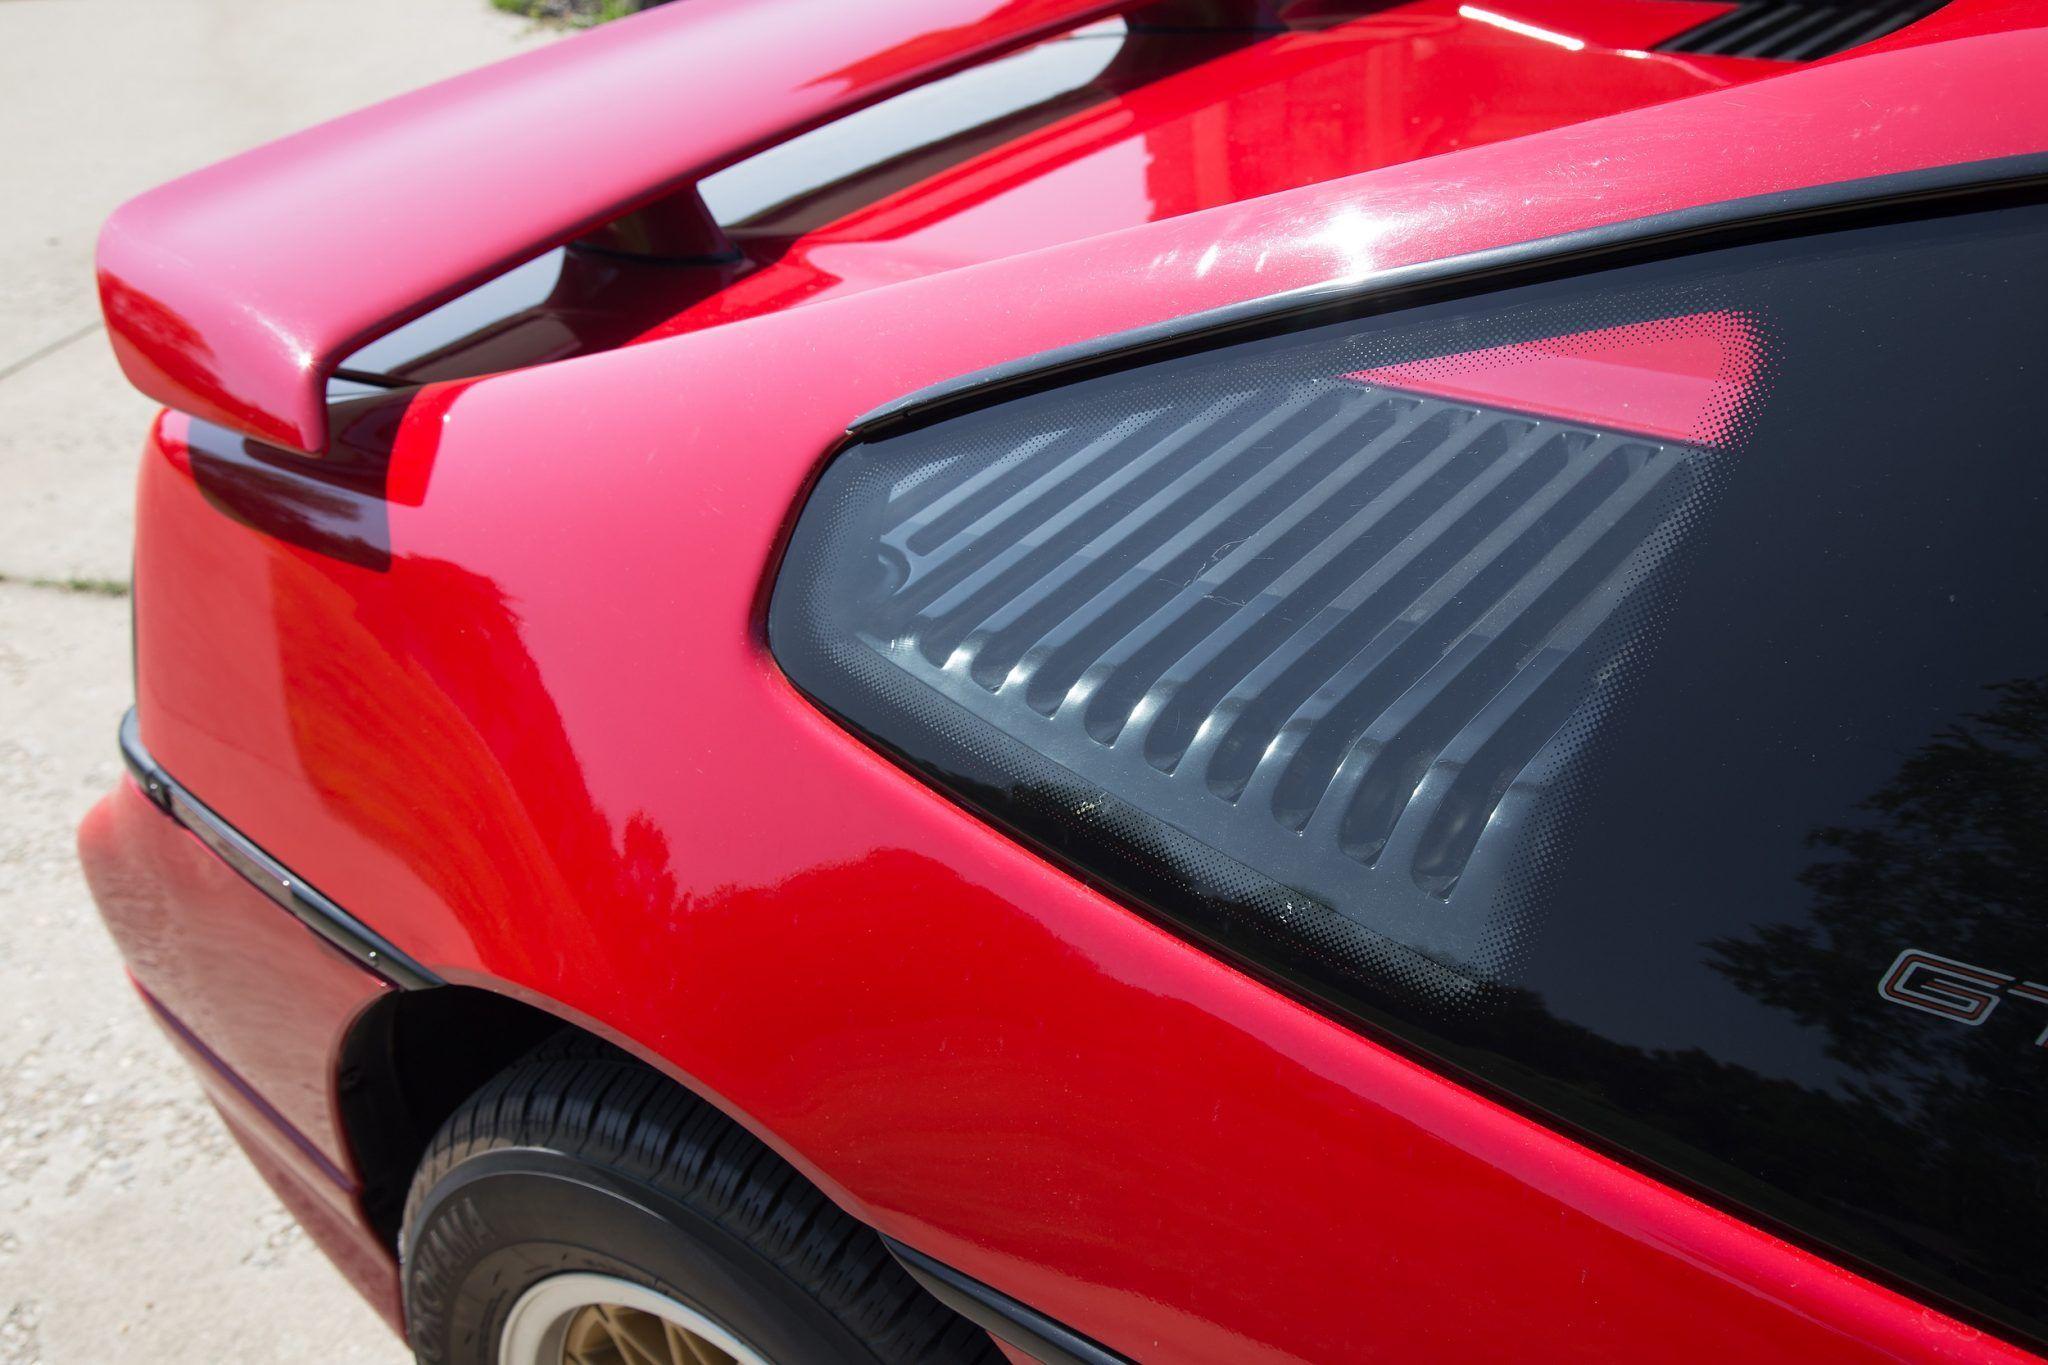 1988 Pontiac Fiero GT 5Speed in 2020 Pontiac fiero gt